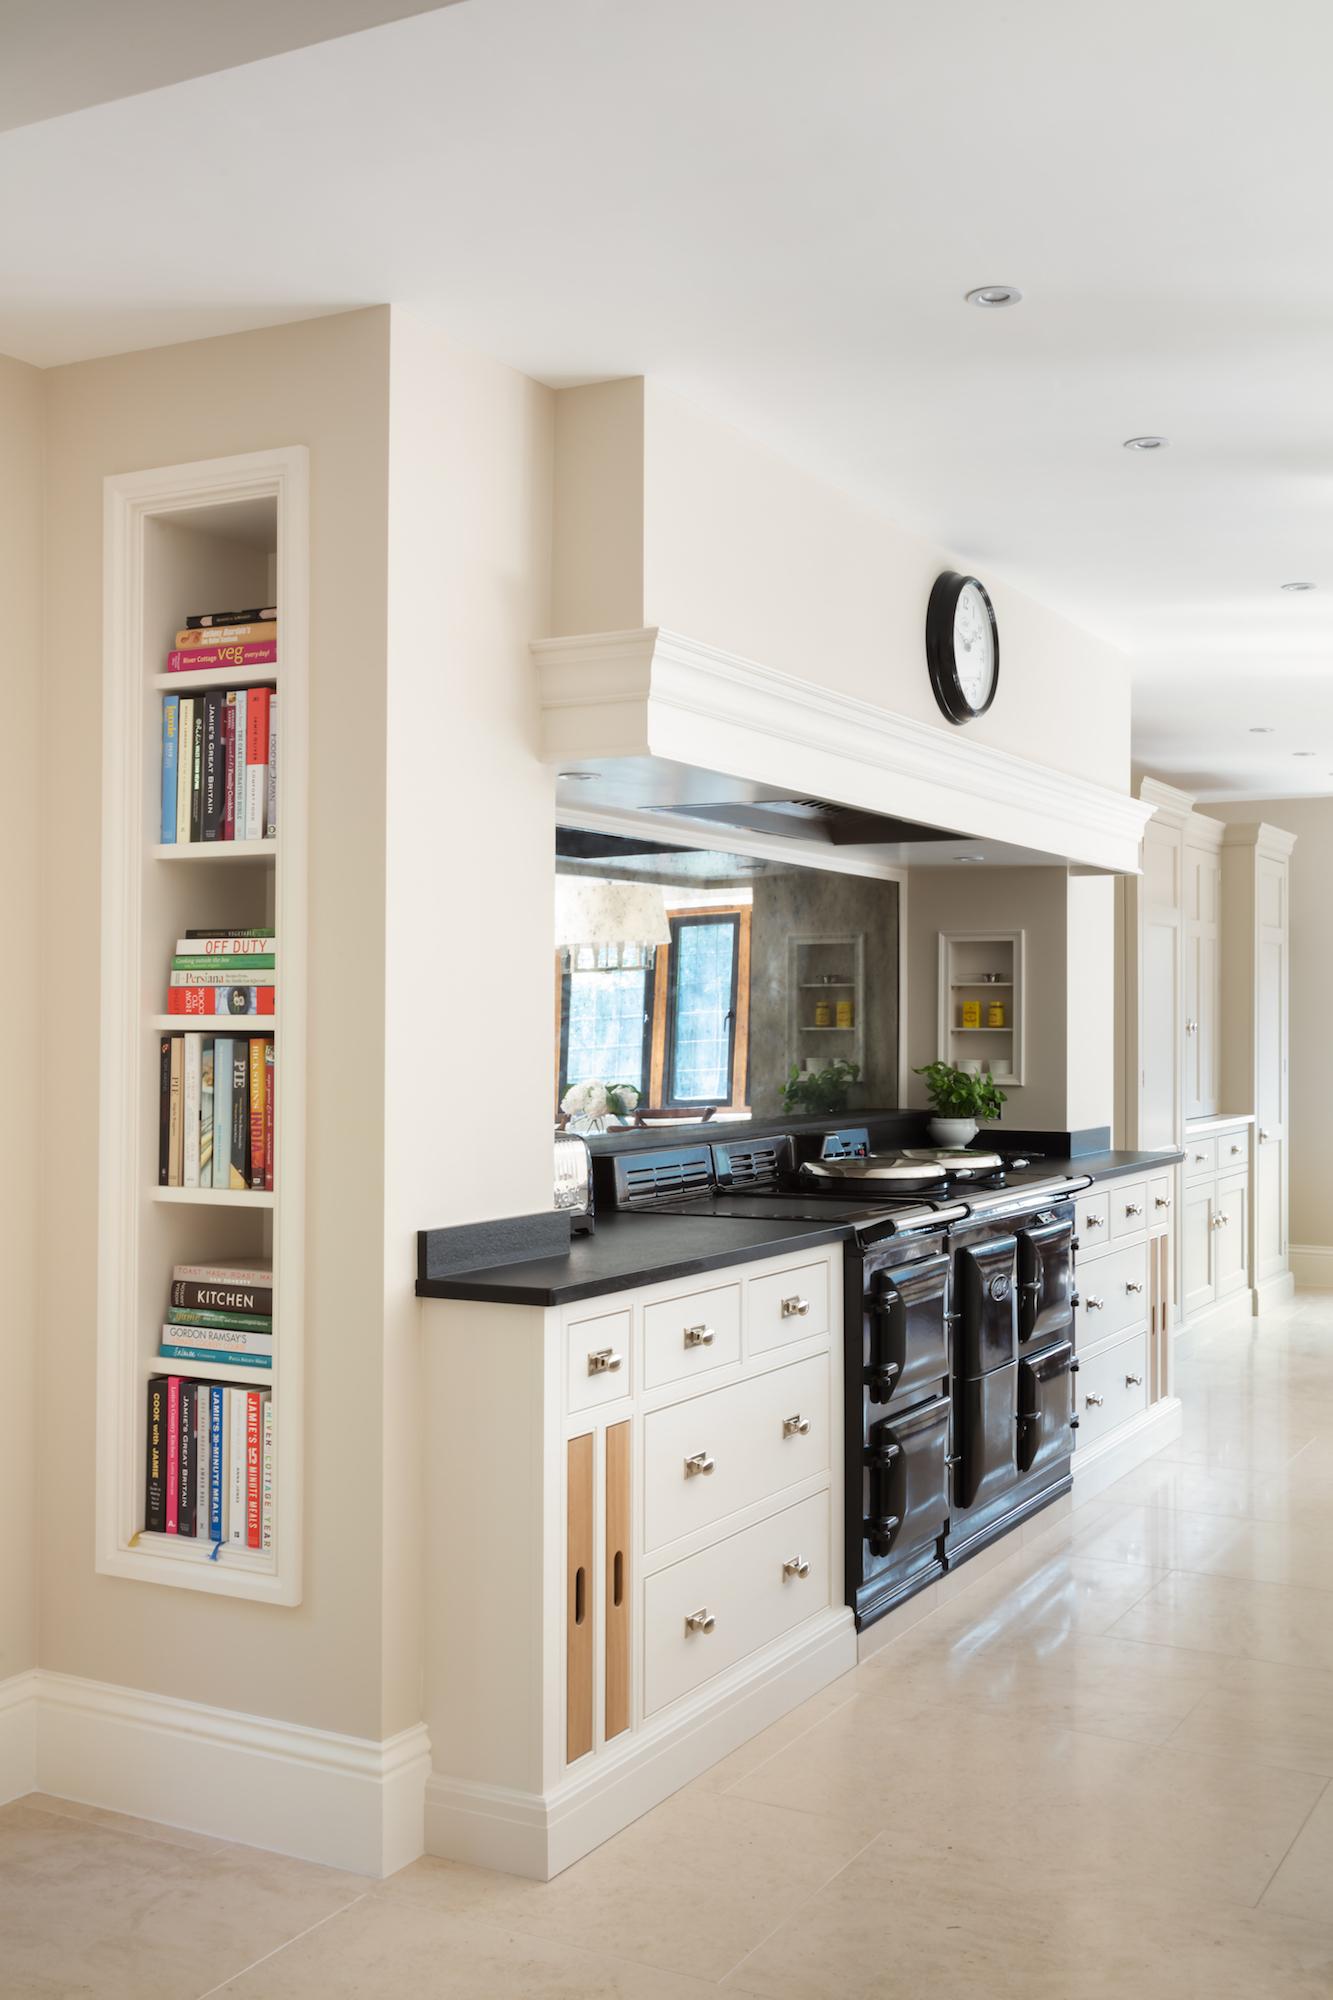 Kitchen Confidential | Gerrards Cross Project - Humphrey Munson Kitchens